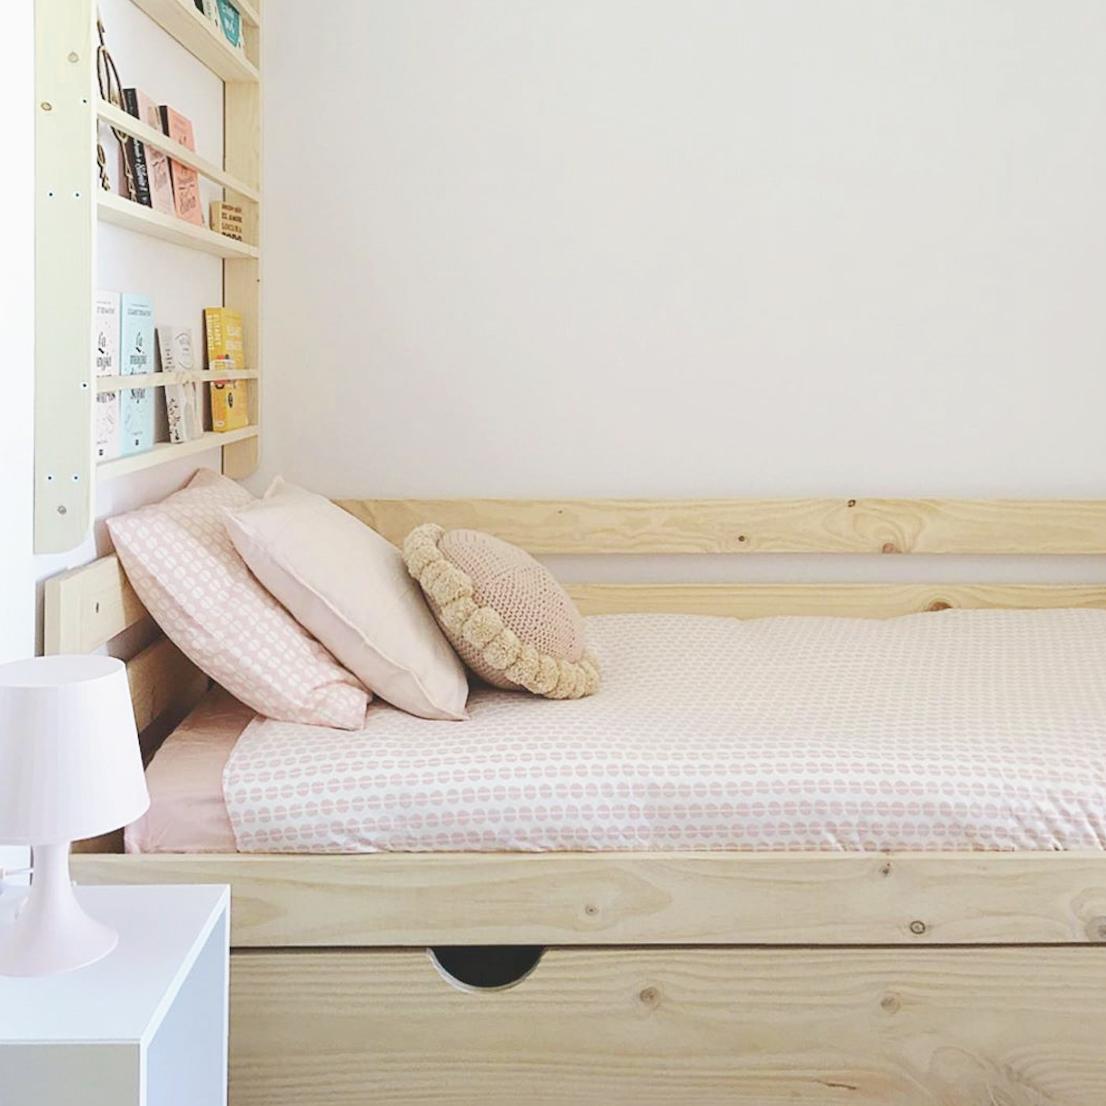 sofá cama nido barato